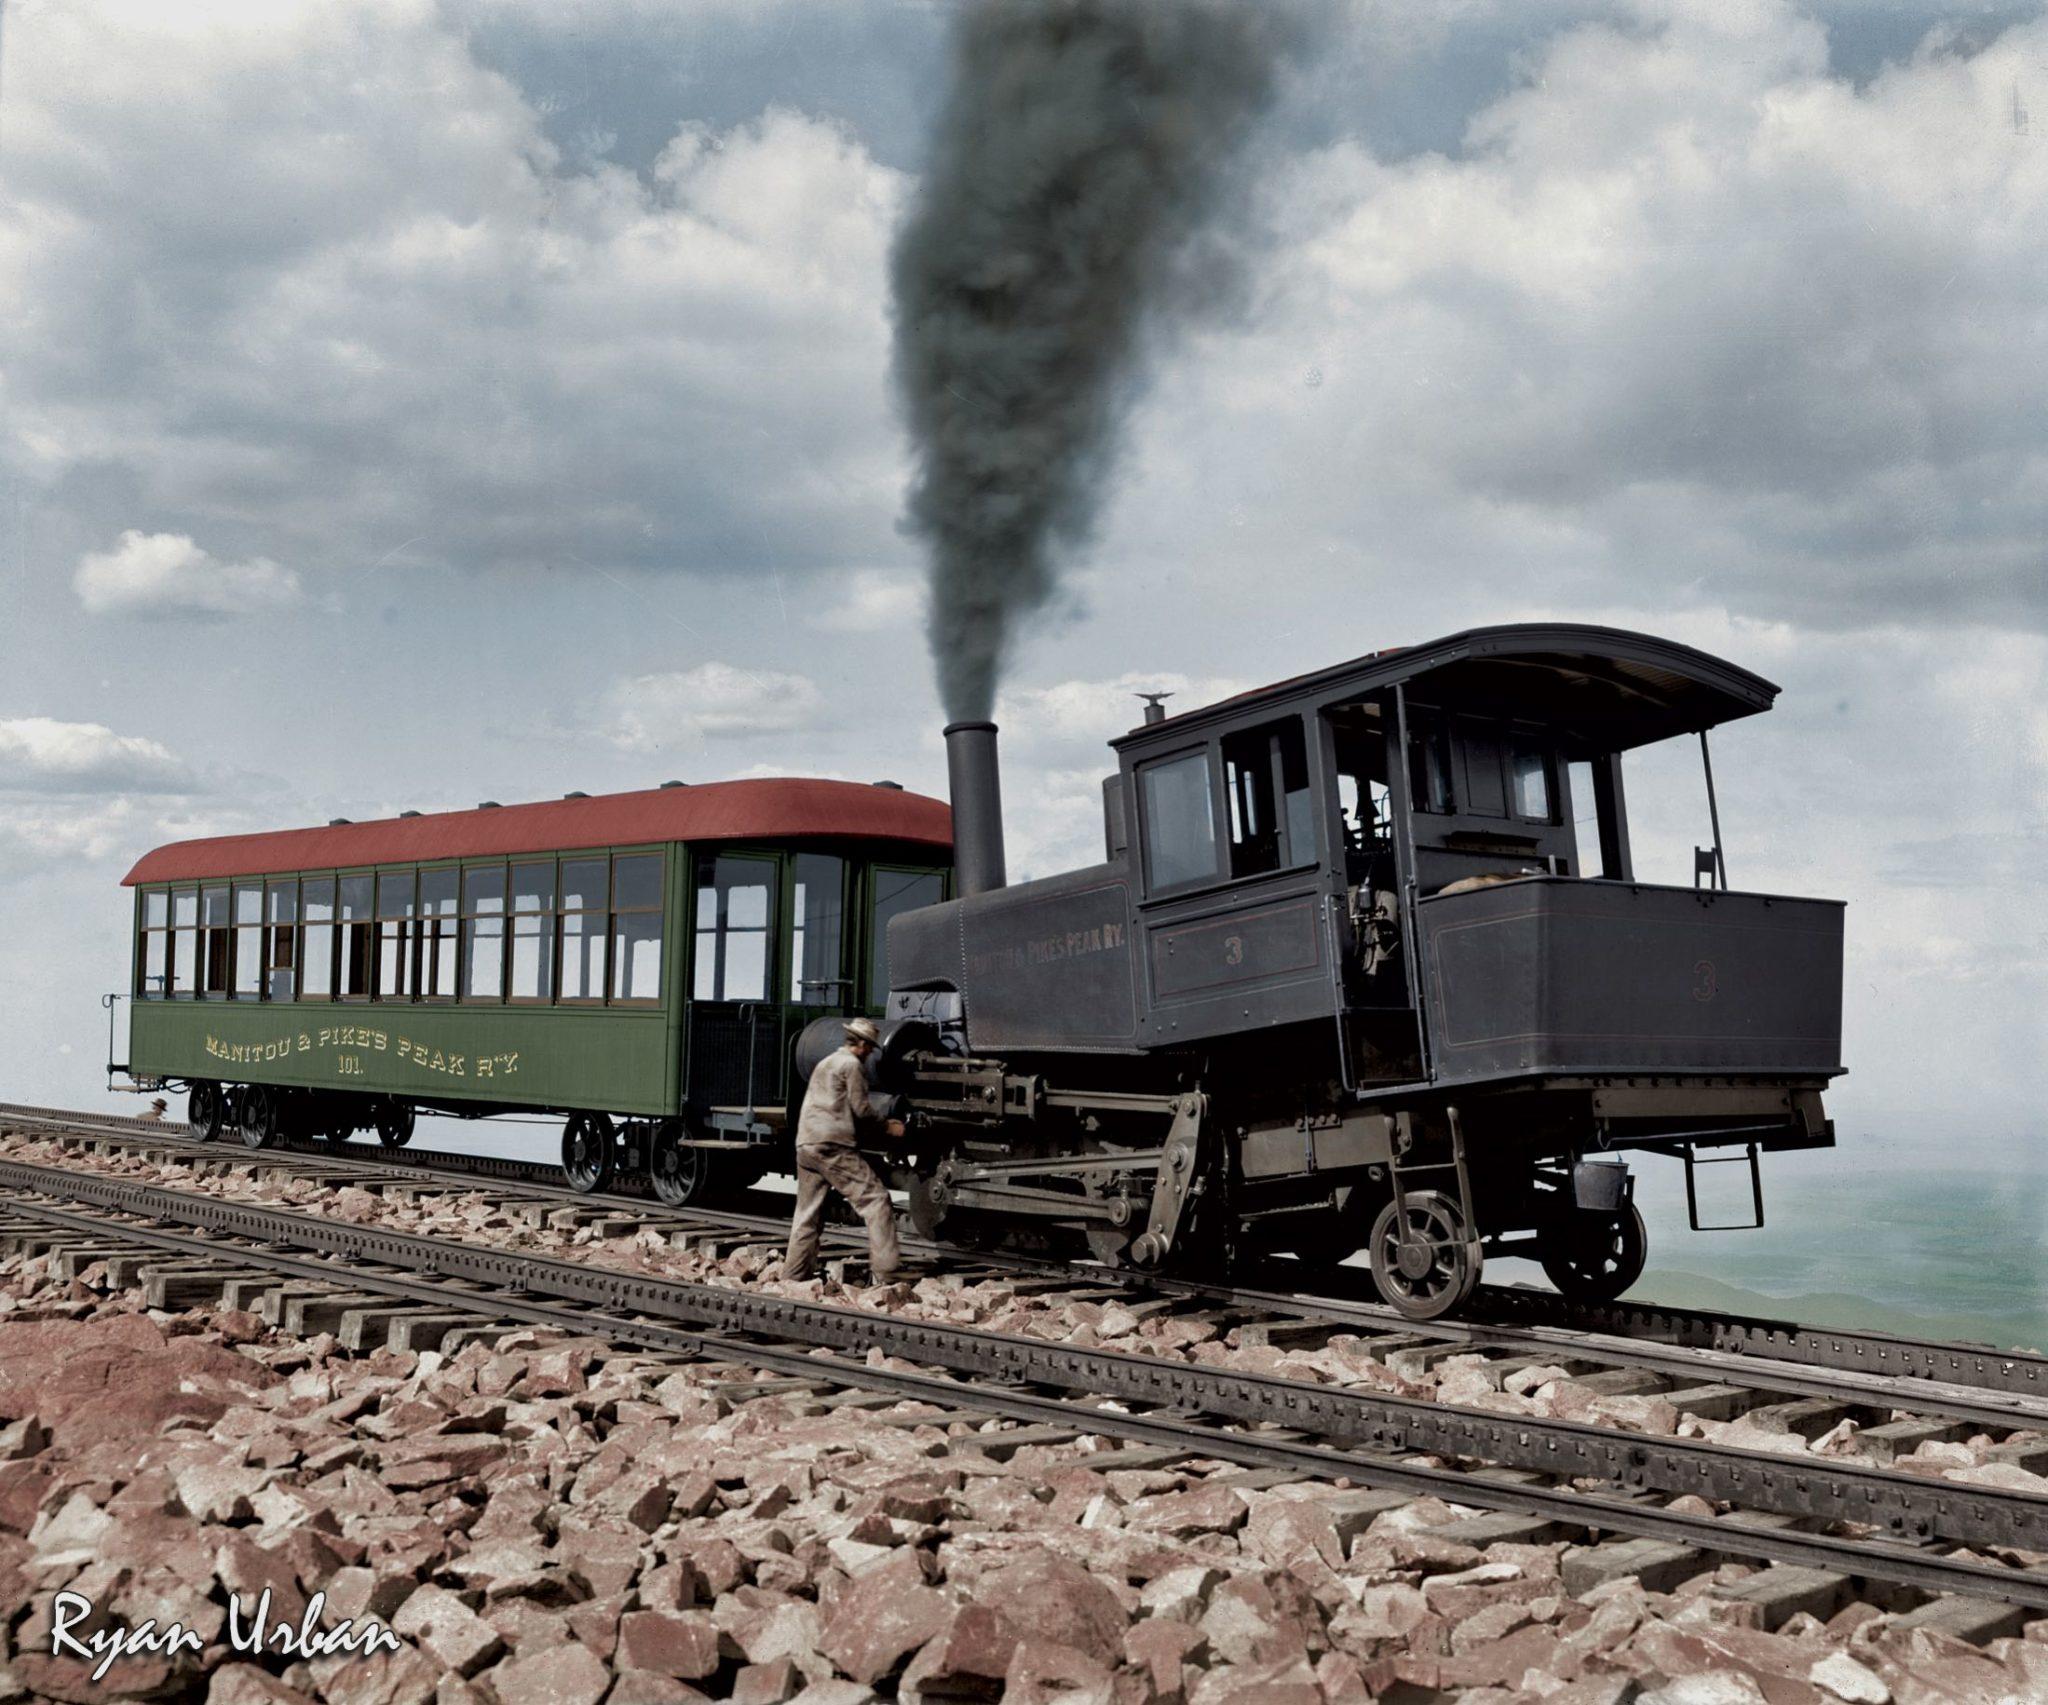 Locomotive et voiture de Pikes Peak Cog Railway, vers 1900 - source N&B: wikipedia - colorisée par Ryan Urban